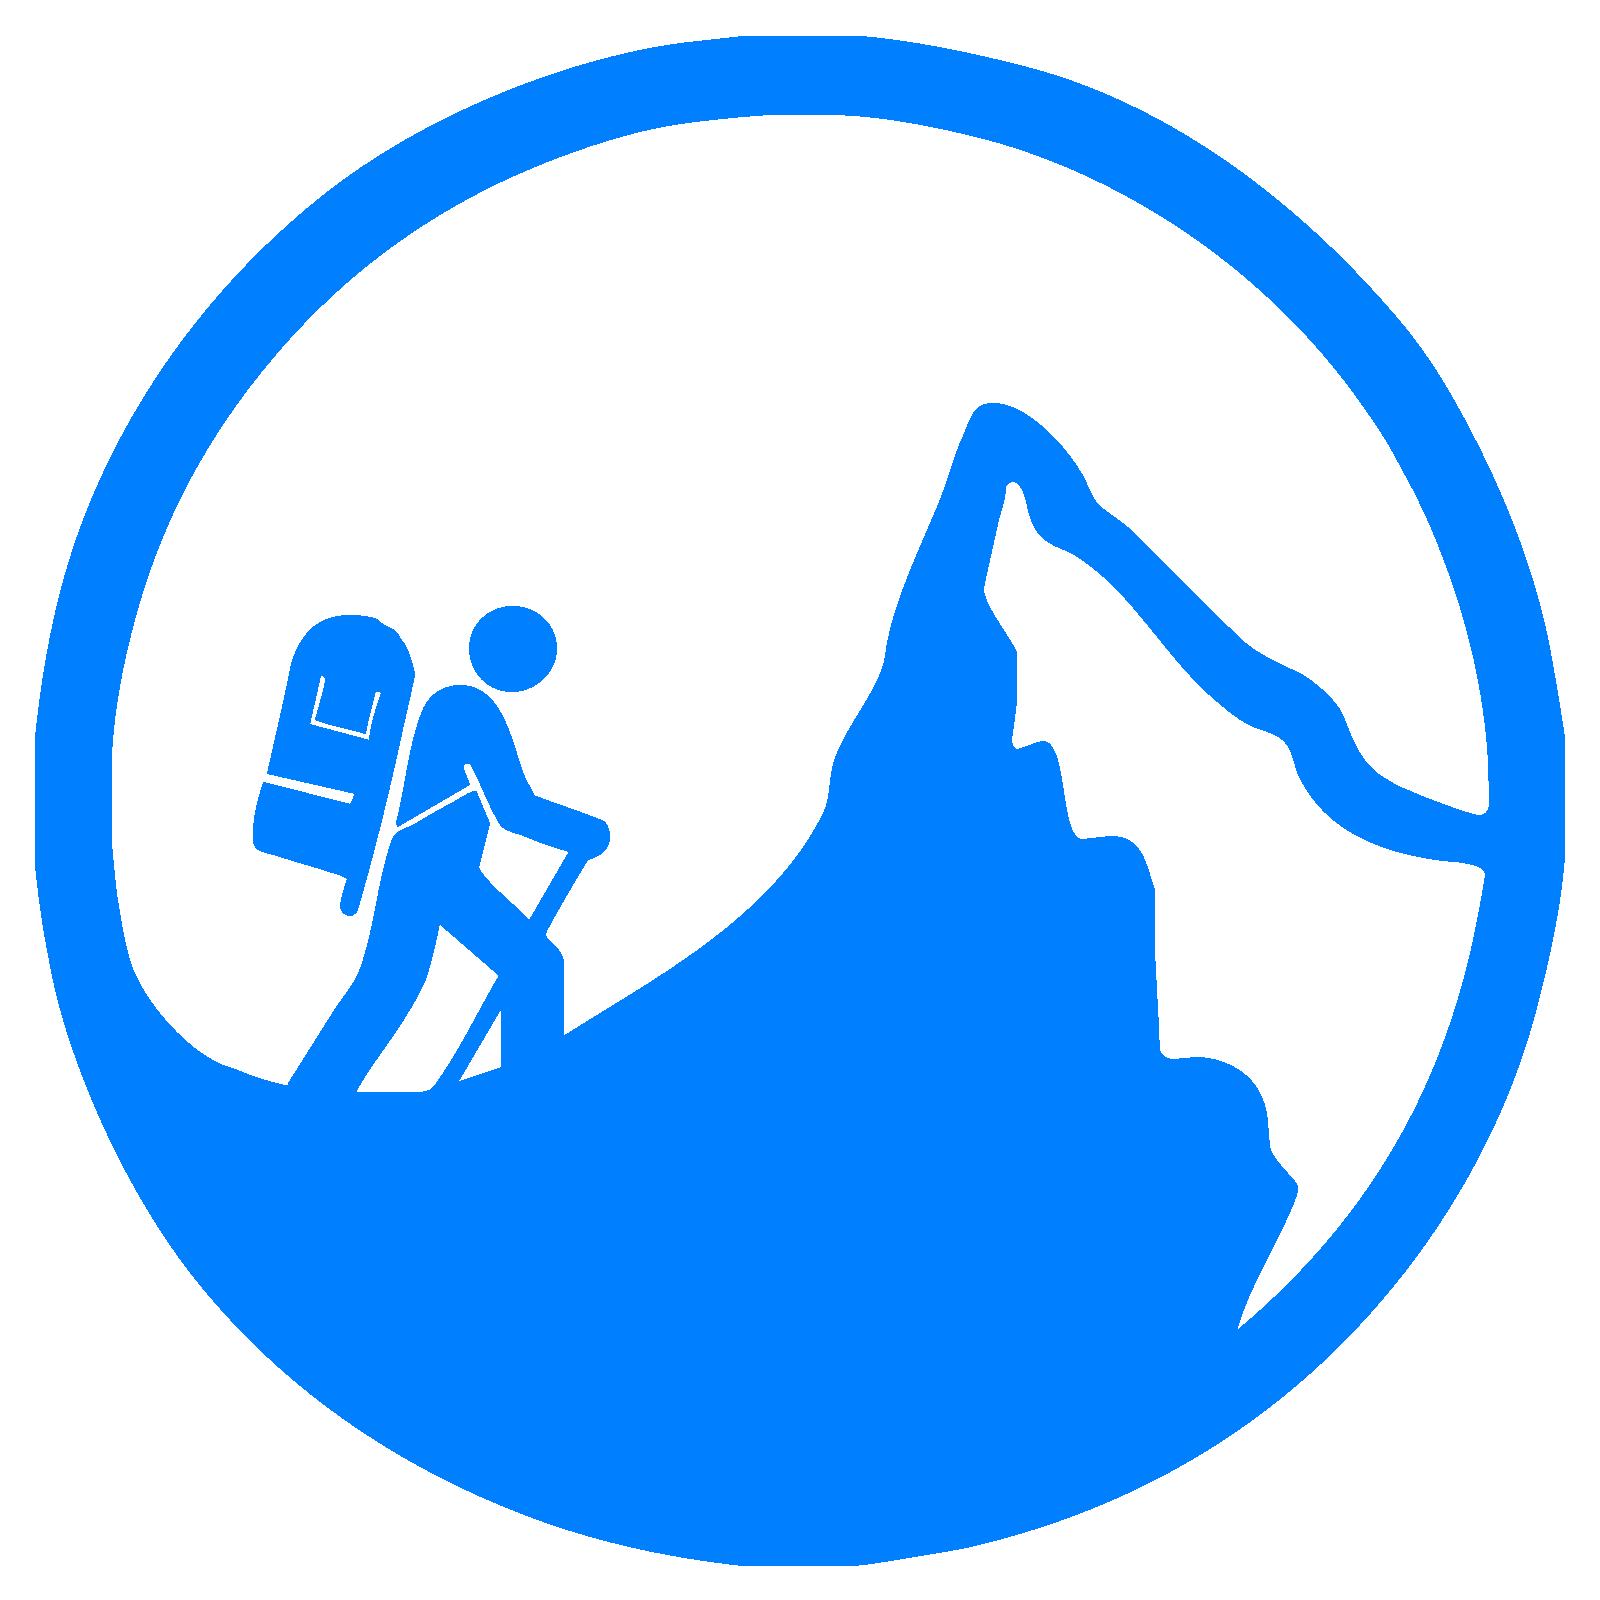 Trekking Agencies' Association of Nepal (TAAN).